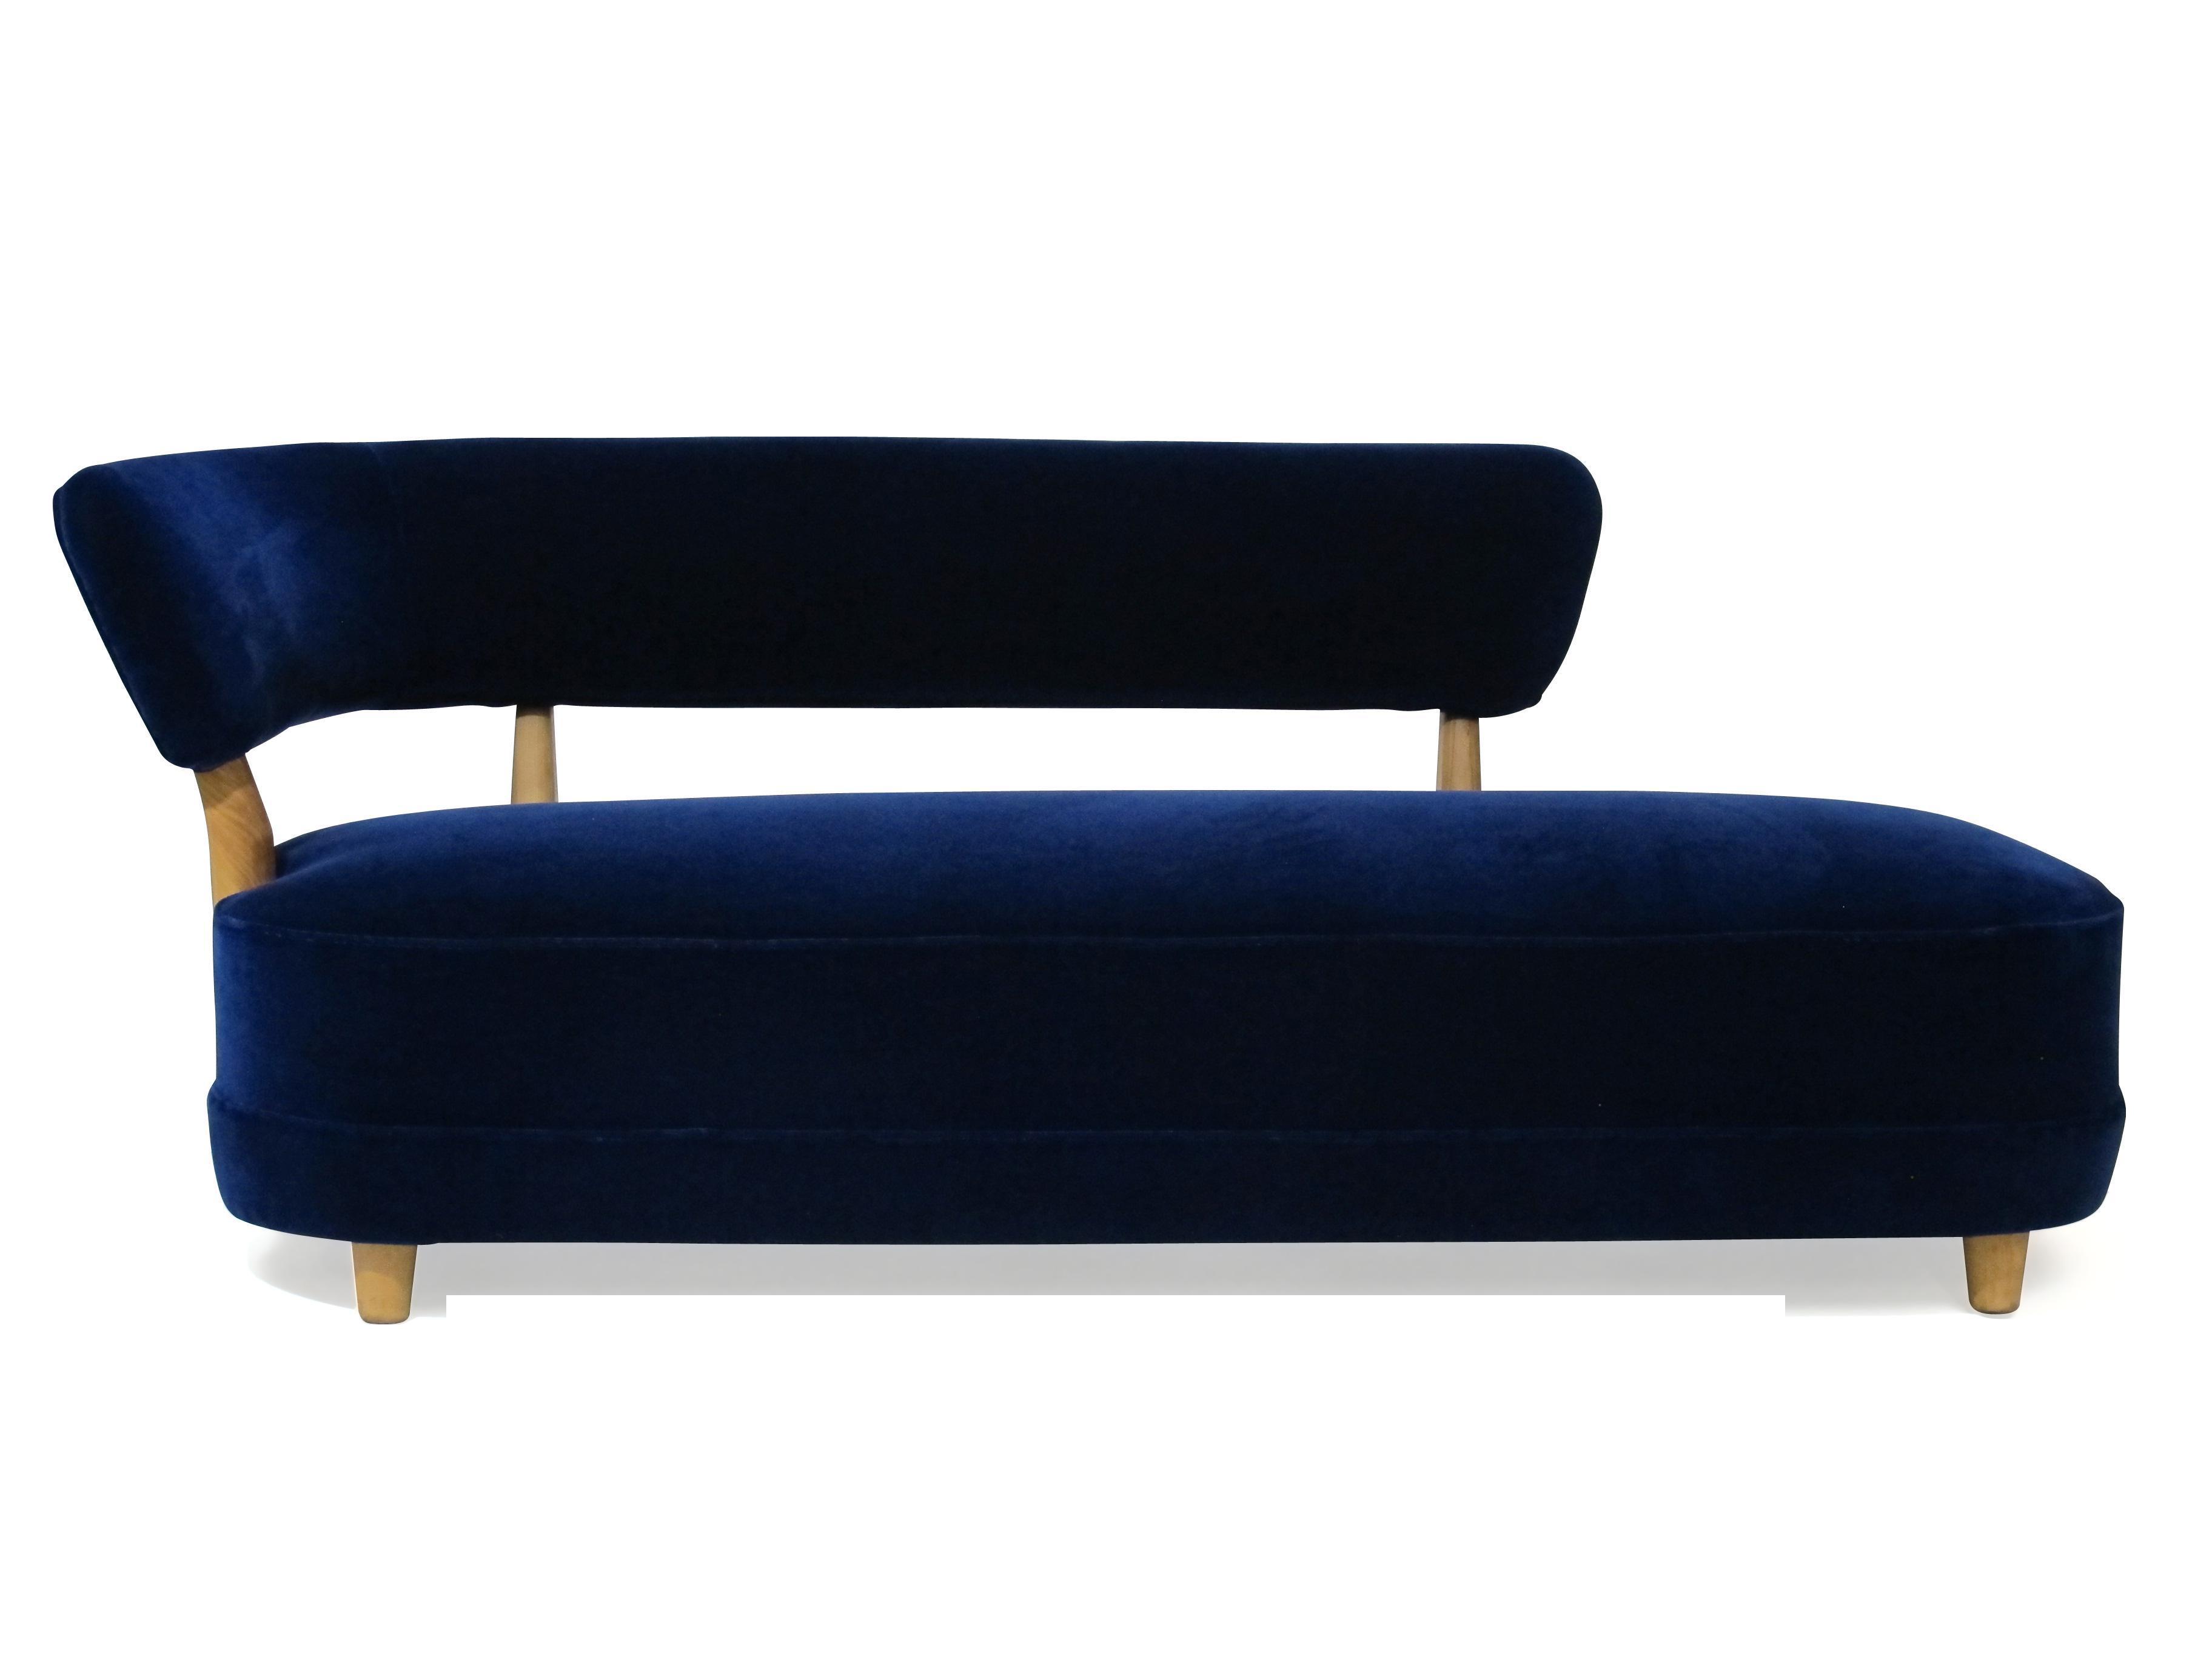 Lovely Otto Schultz for Boet 1940's Danish Deco Sofa